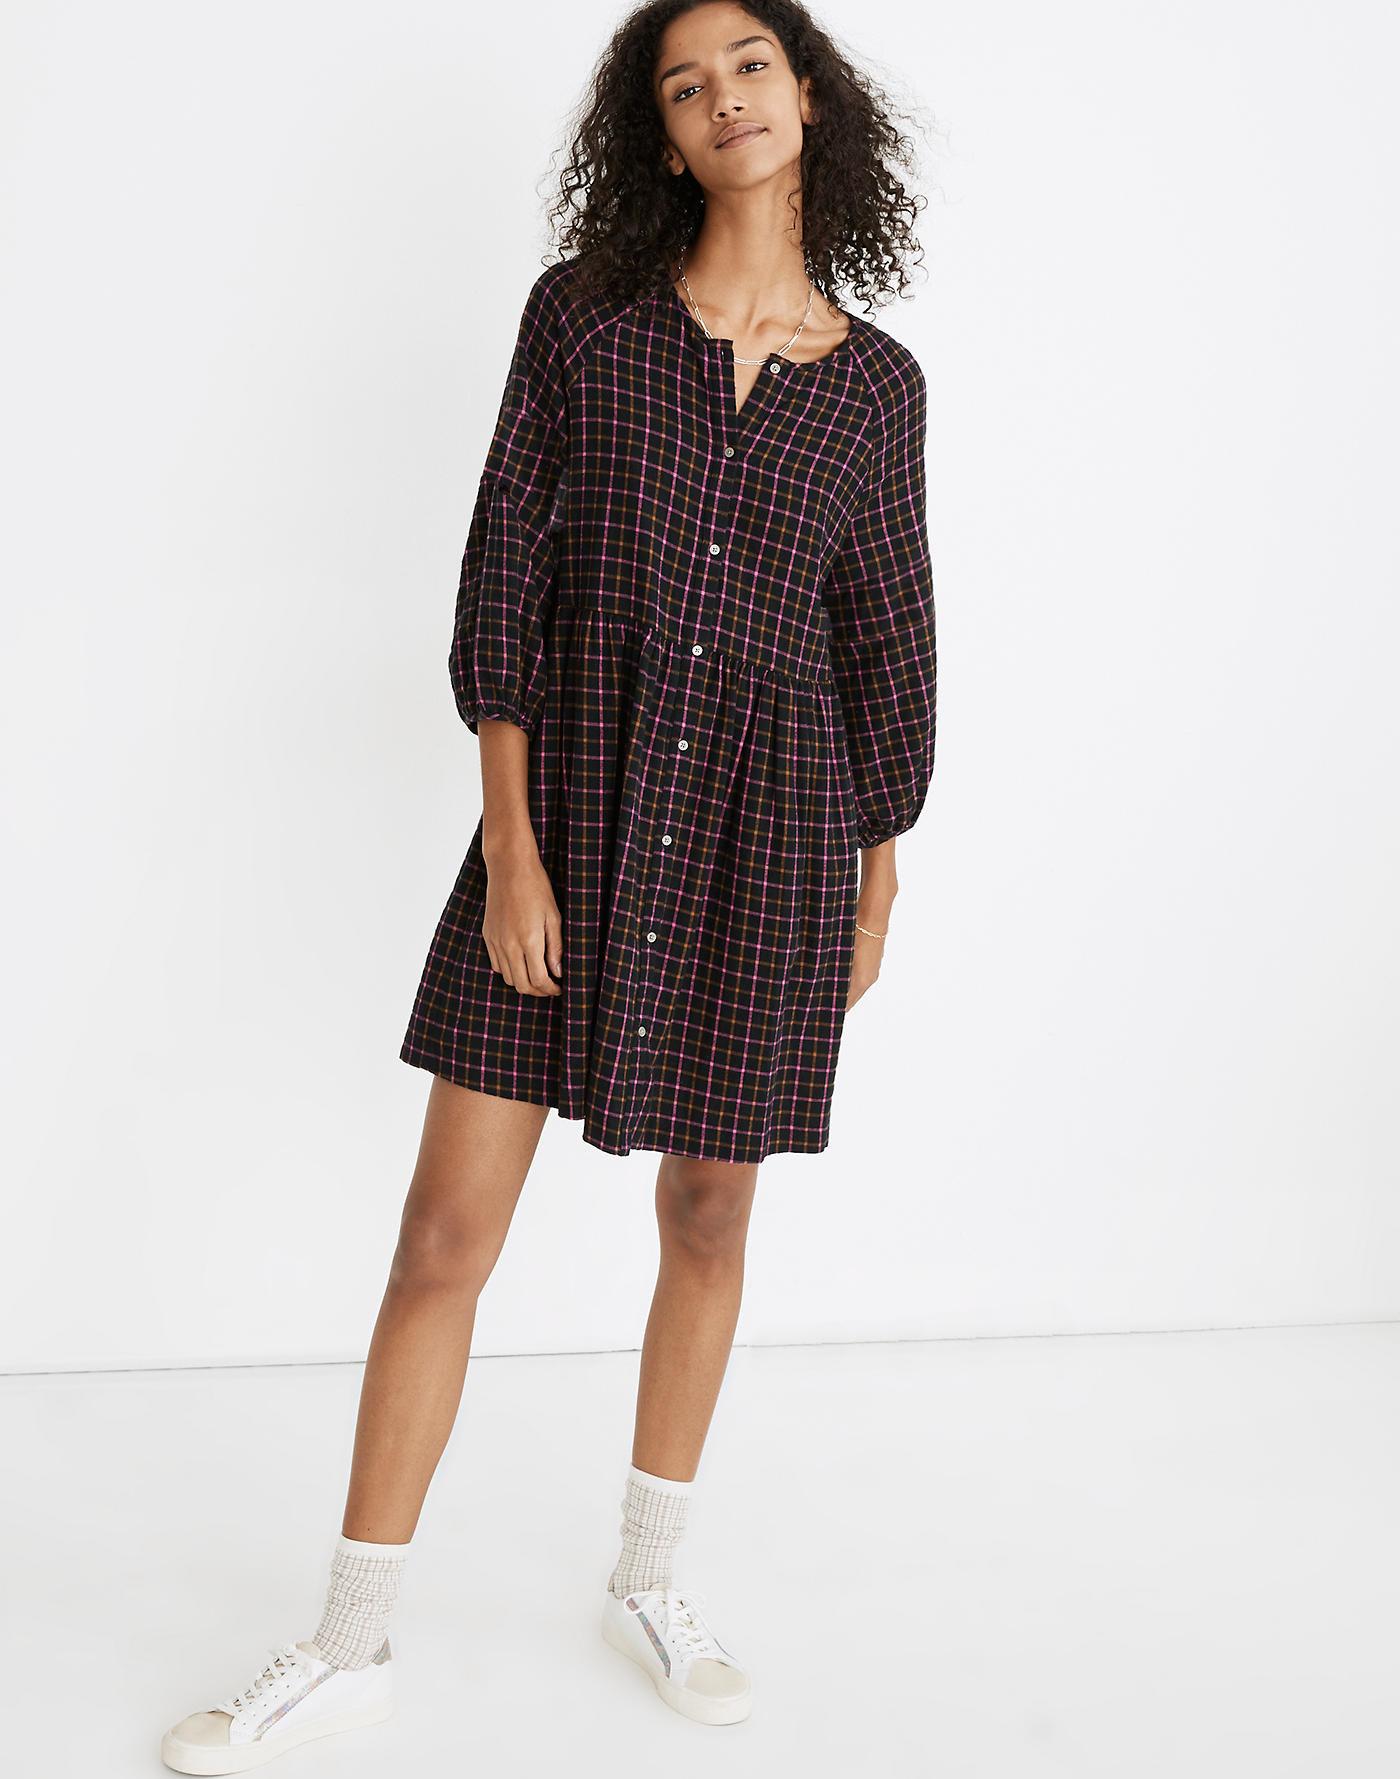 Model wearing plaid dress